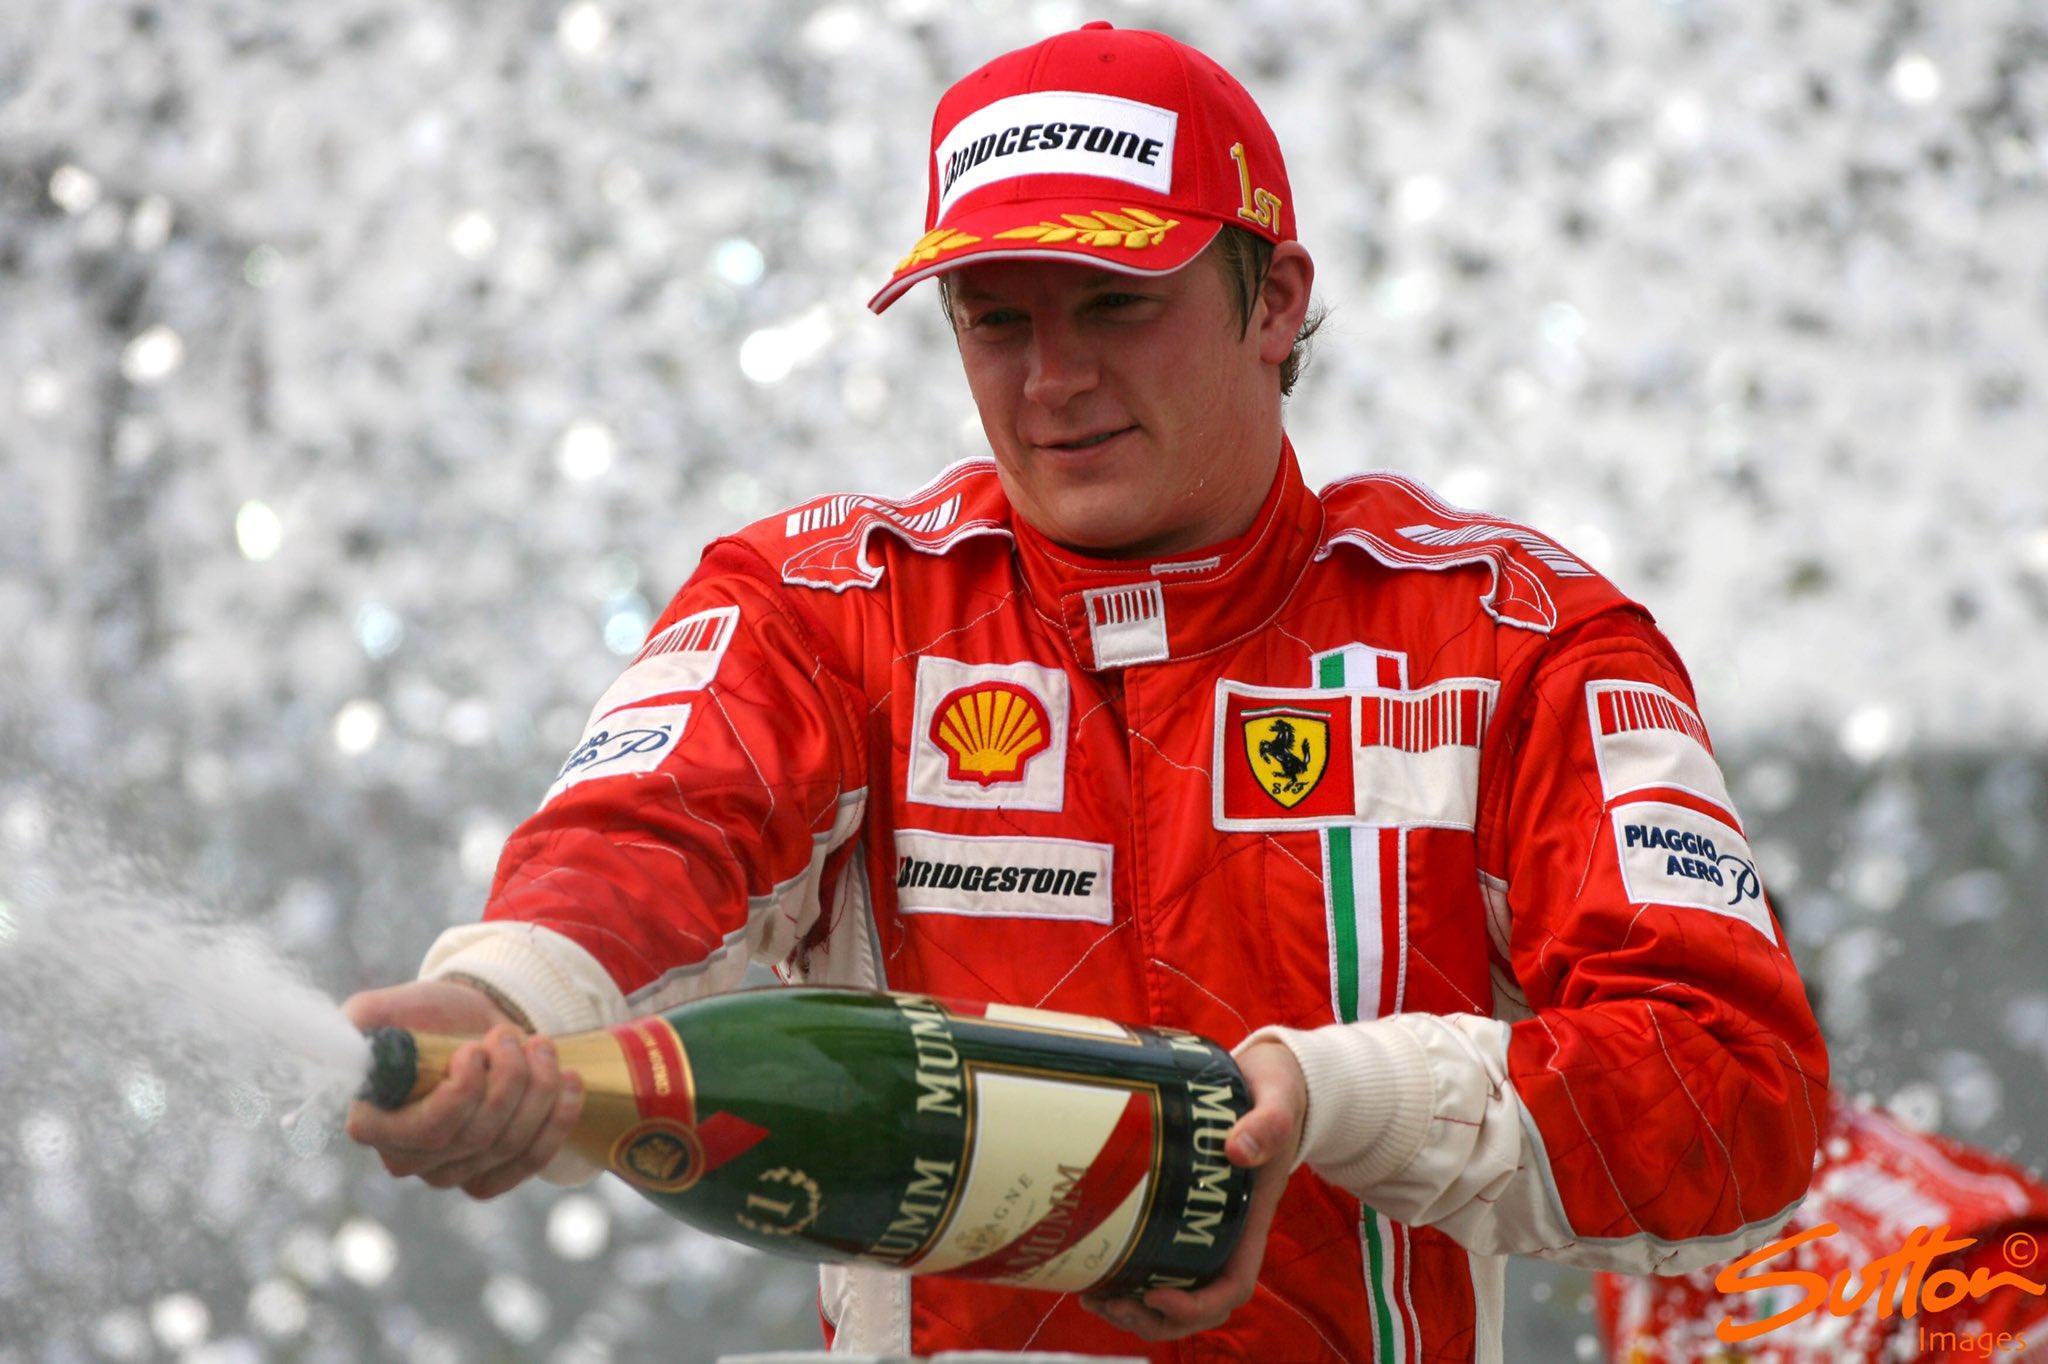 Suttonimages: Happy Birthday to 2007 F1 World Champion Kimi Raikkonen, born on this day in 1979